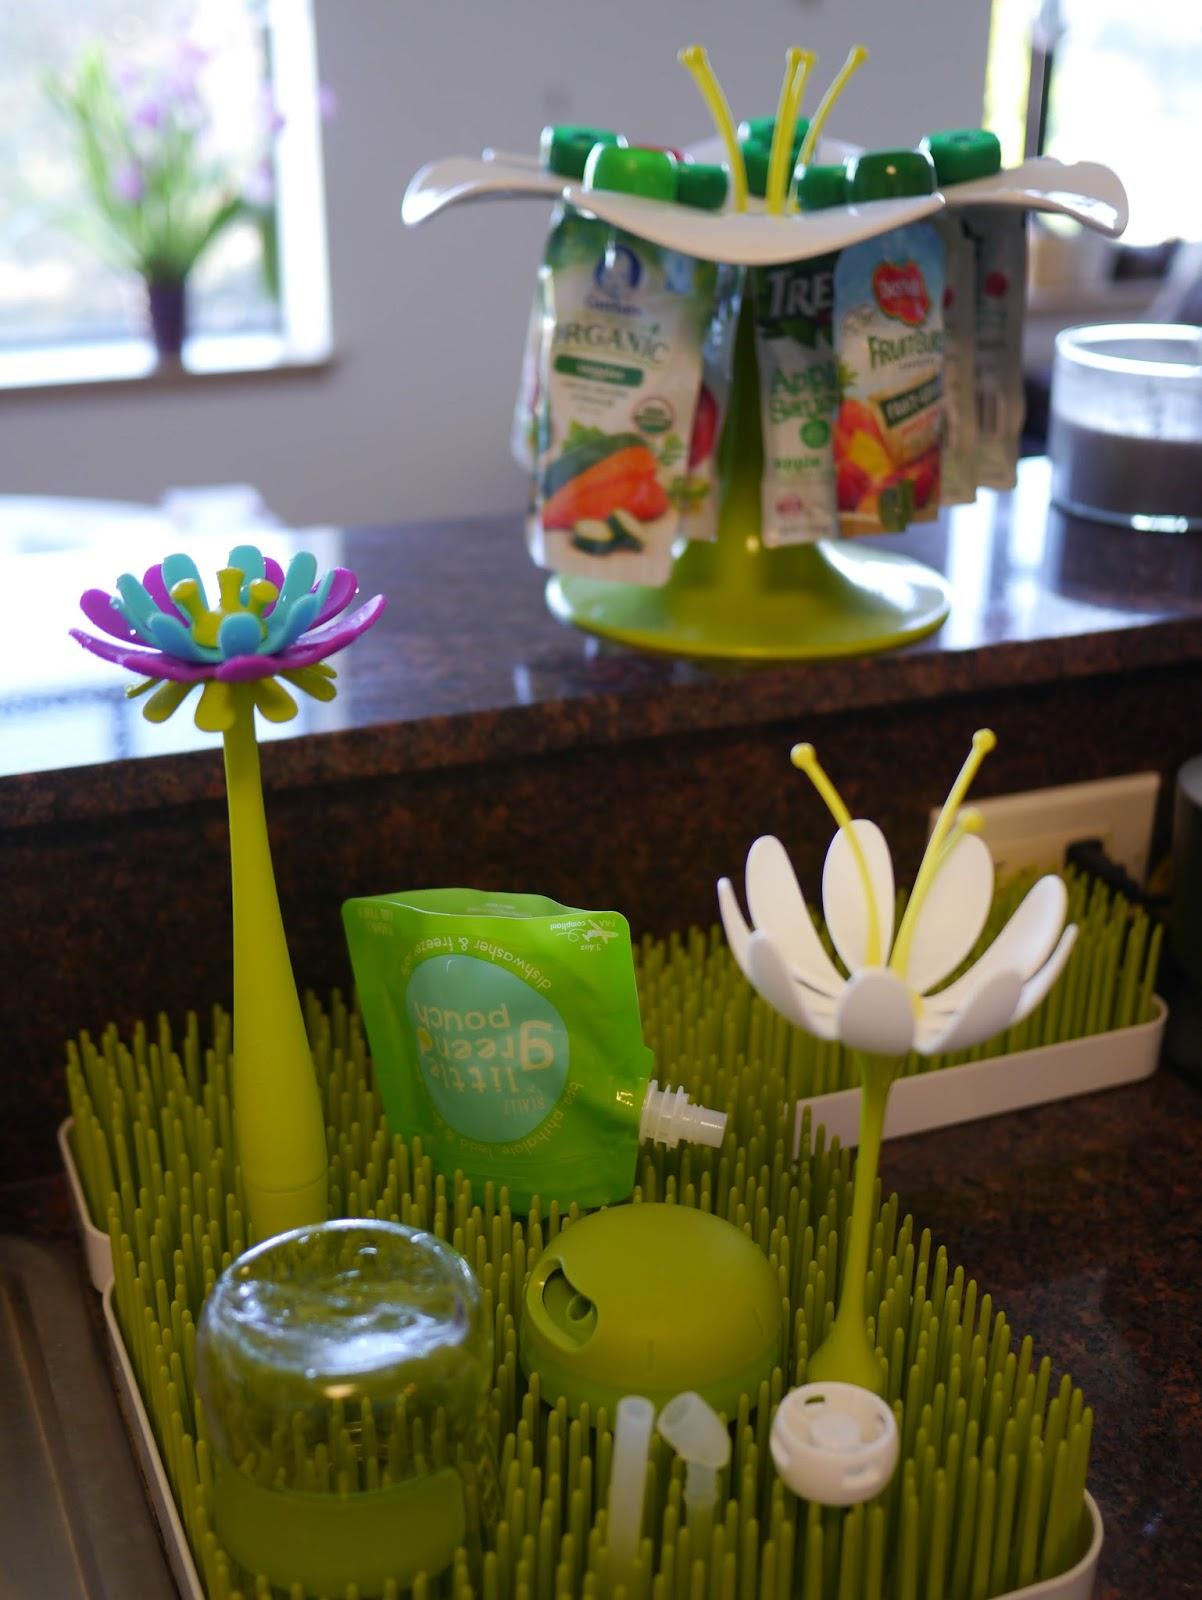 Little Hiccups My Kitchen Flower Garden With Boon